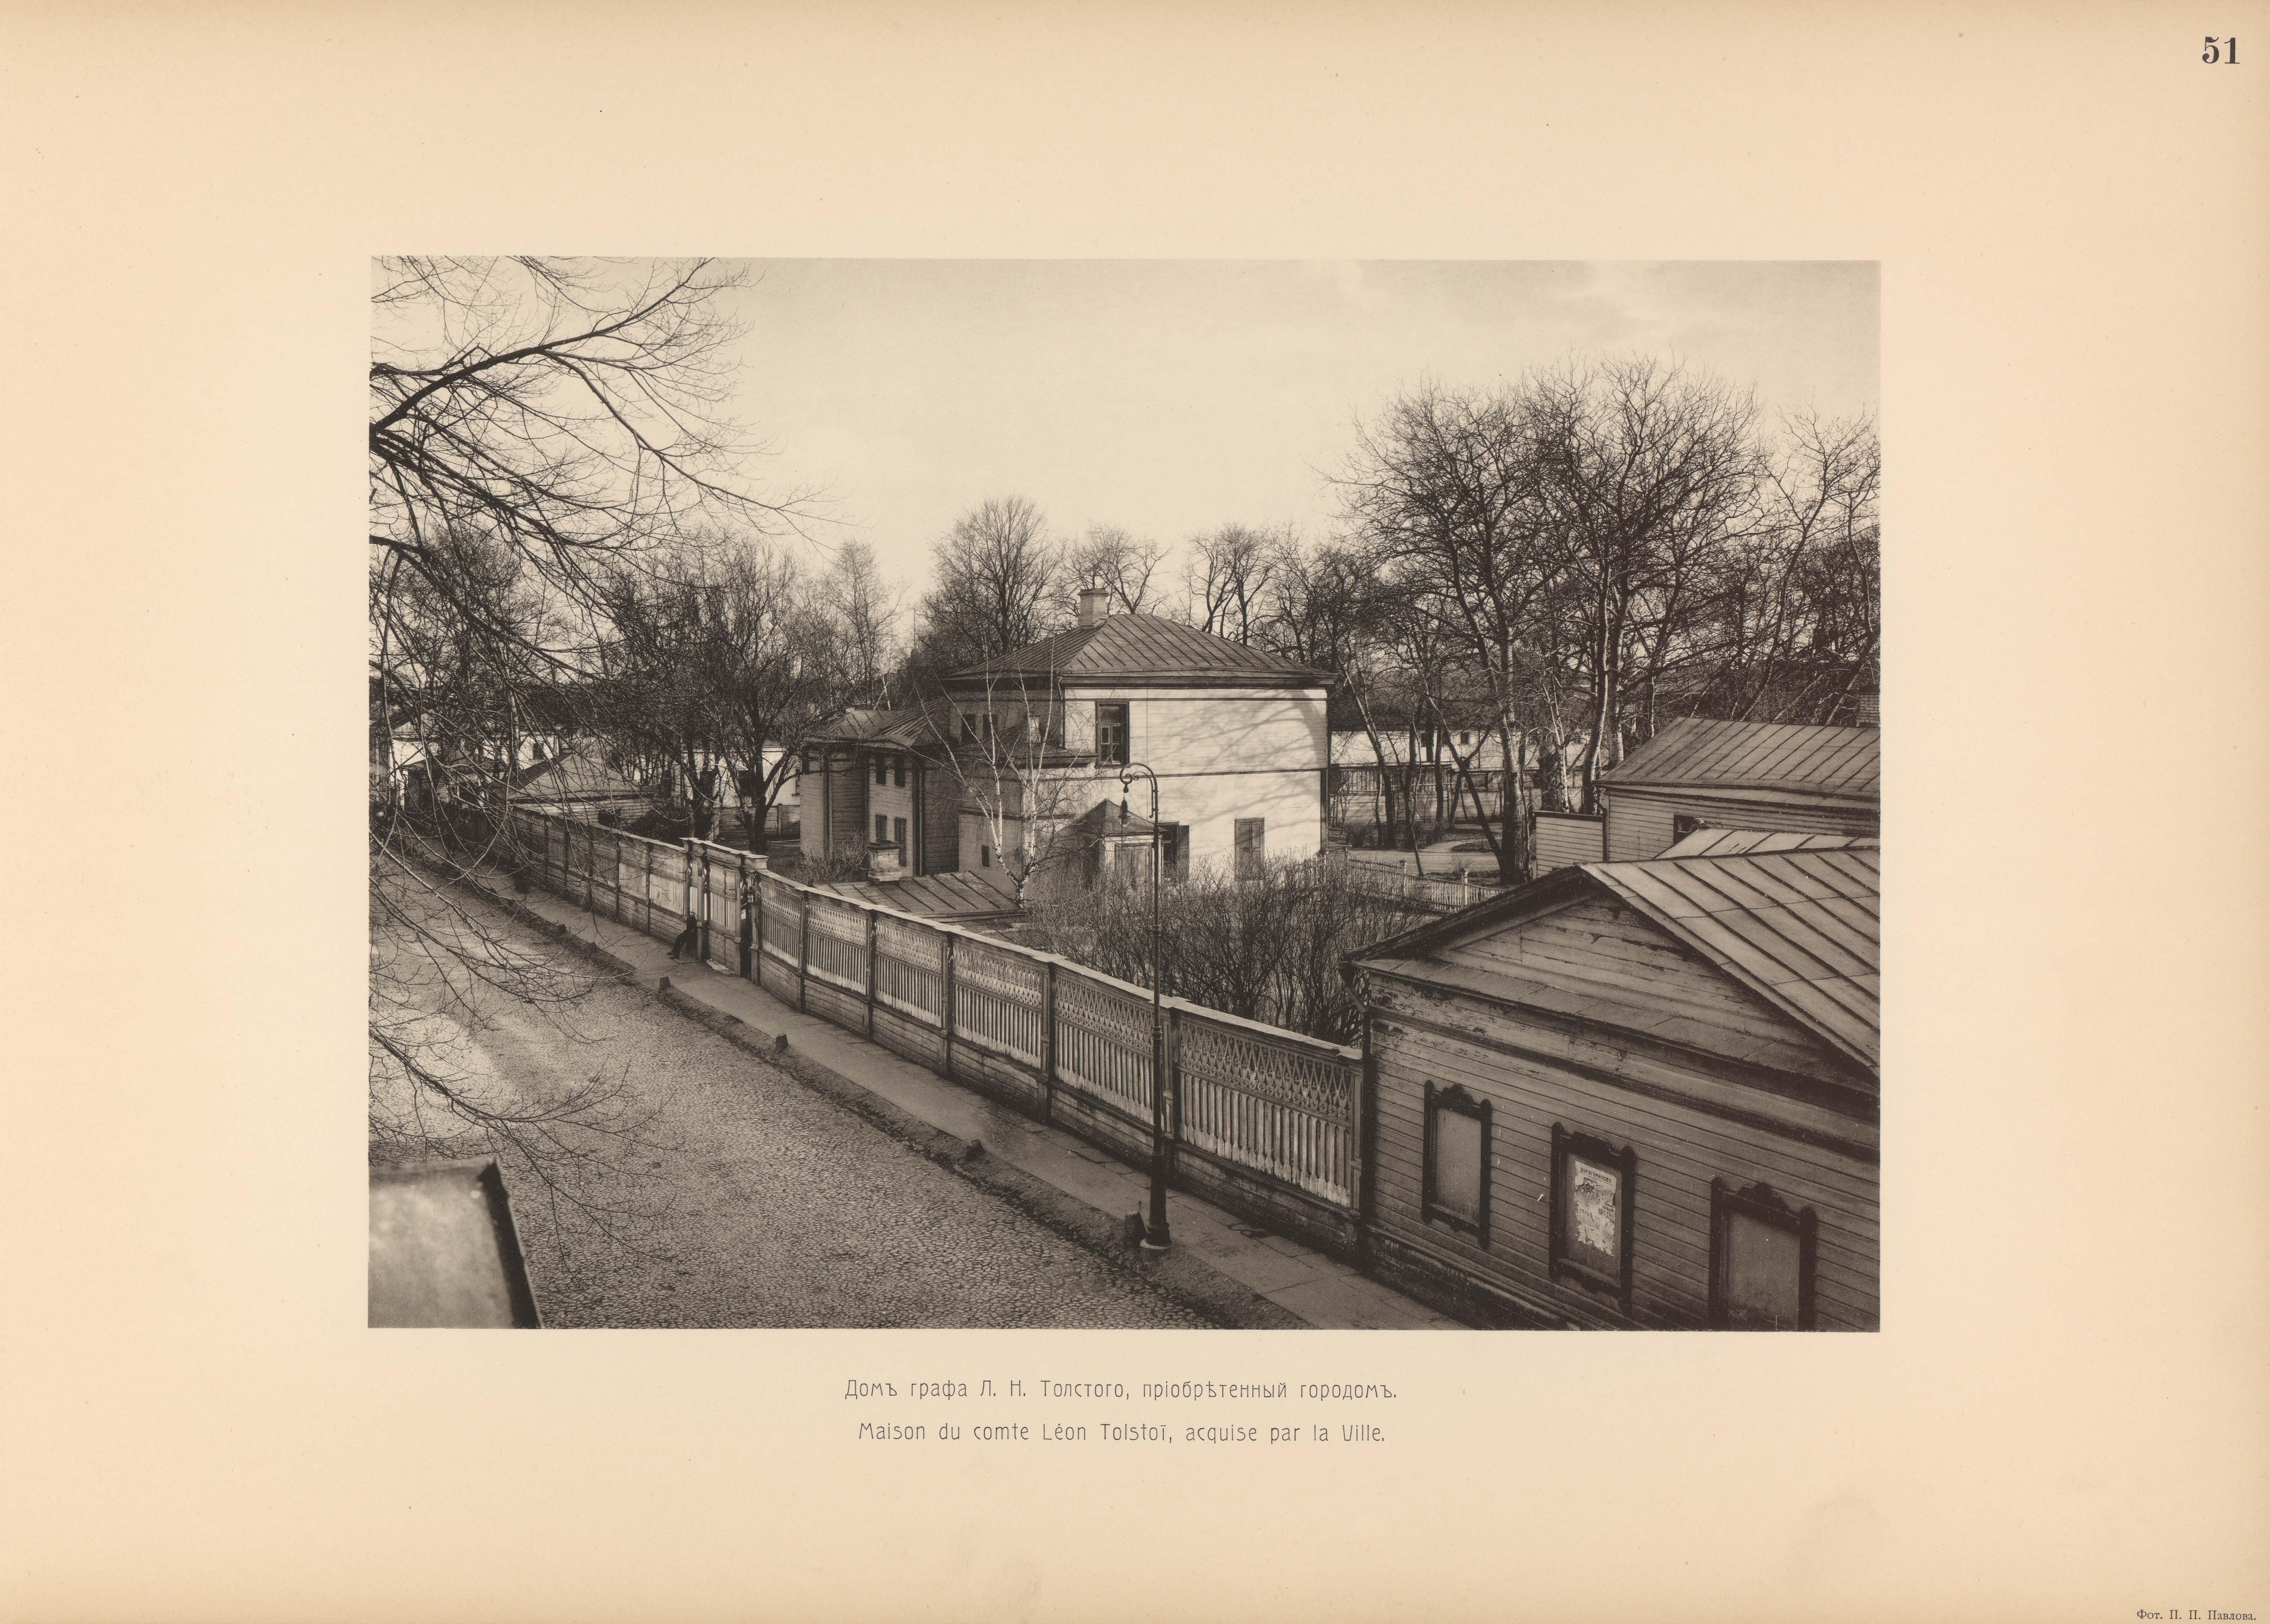 Домъ графа Л. Н. Толстого, прiобрътенный городомъ. Видъ съ Хамовническаго пер.